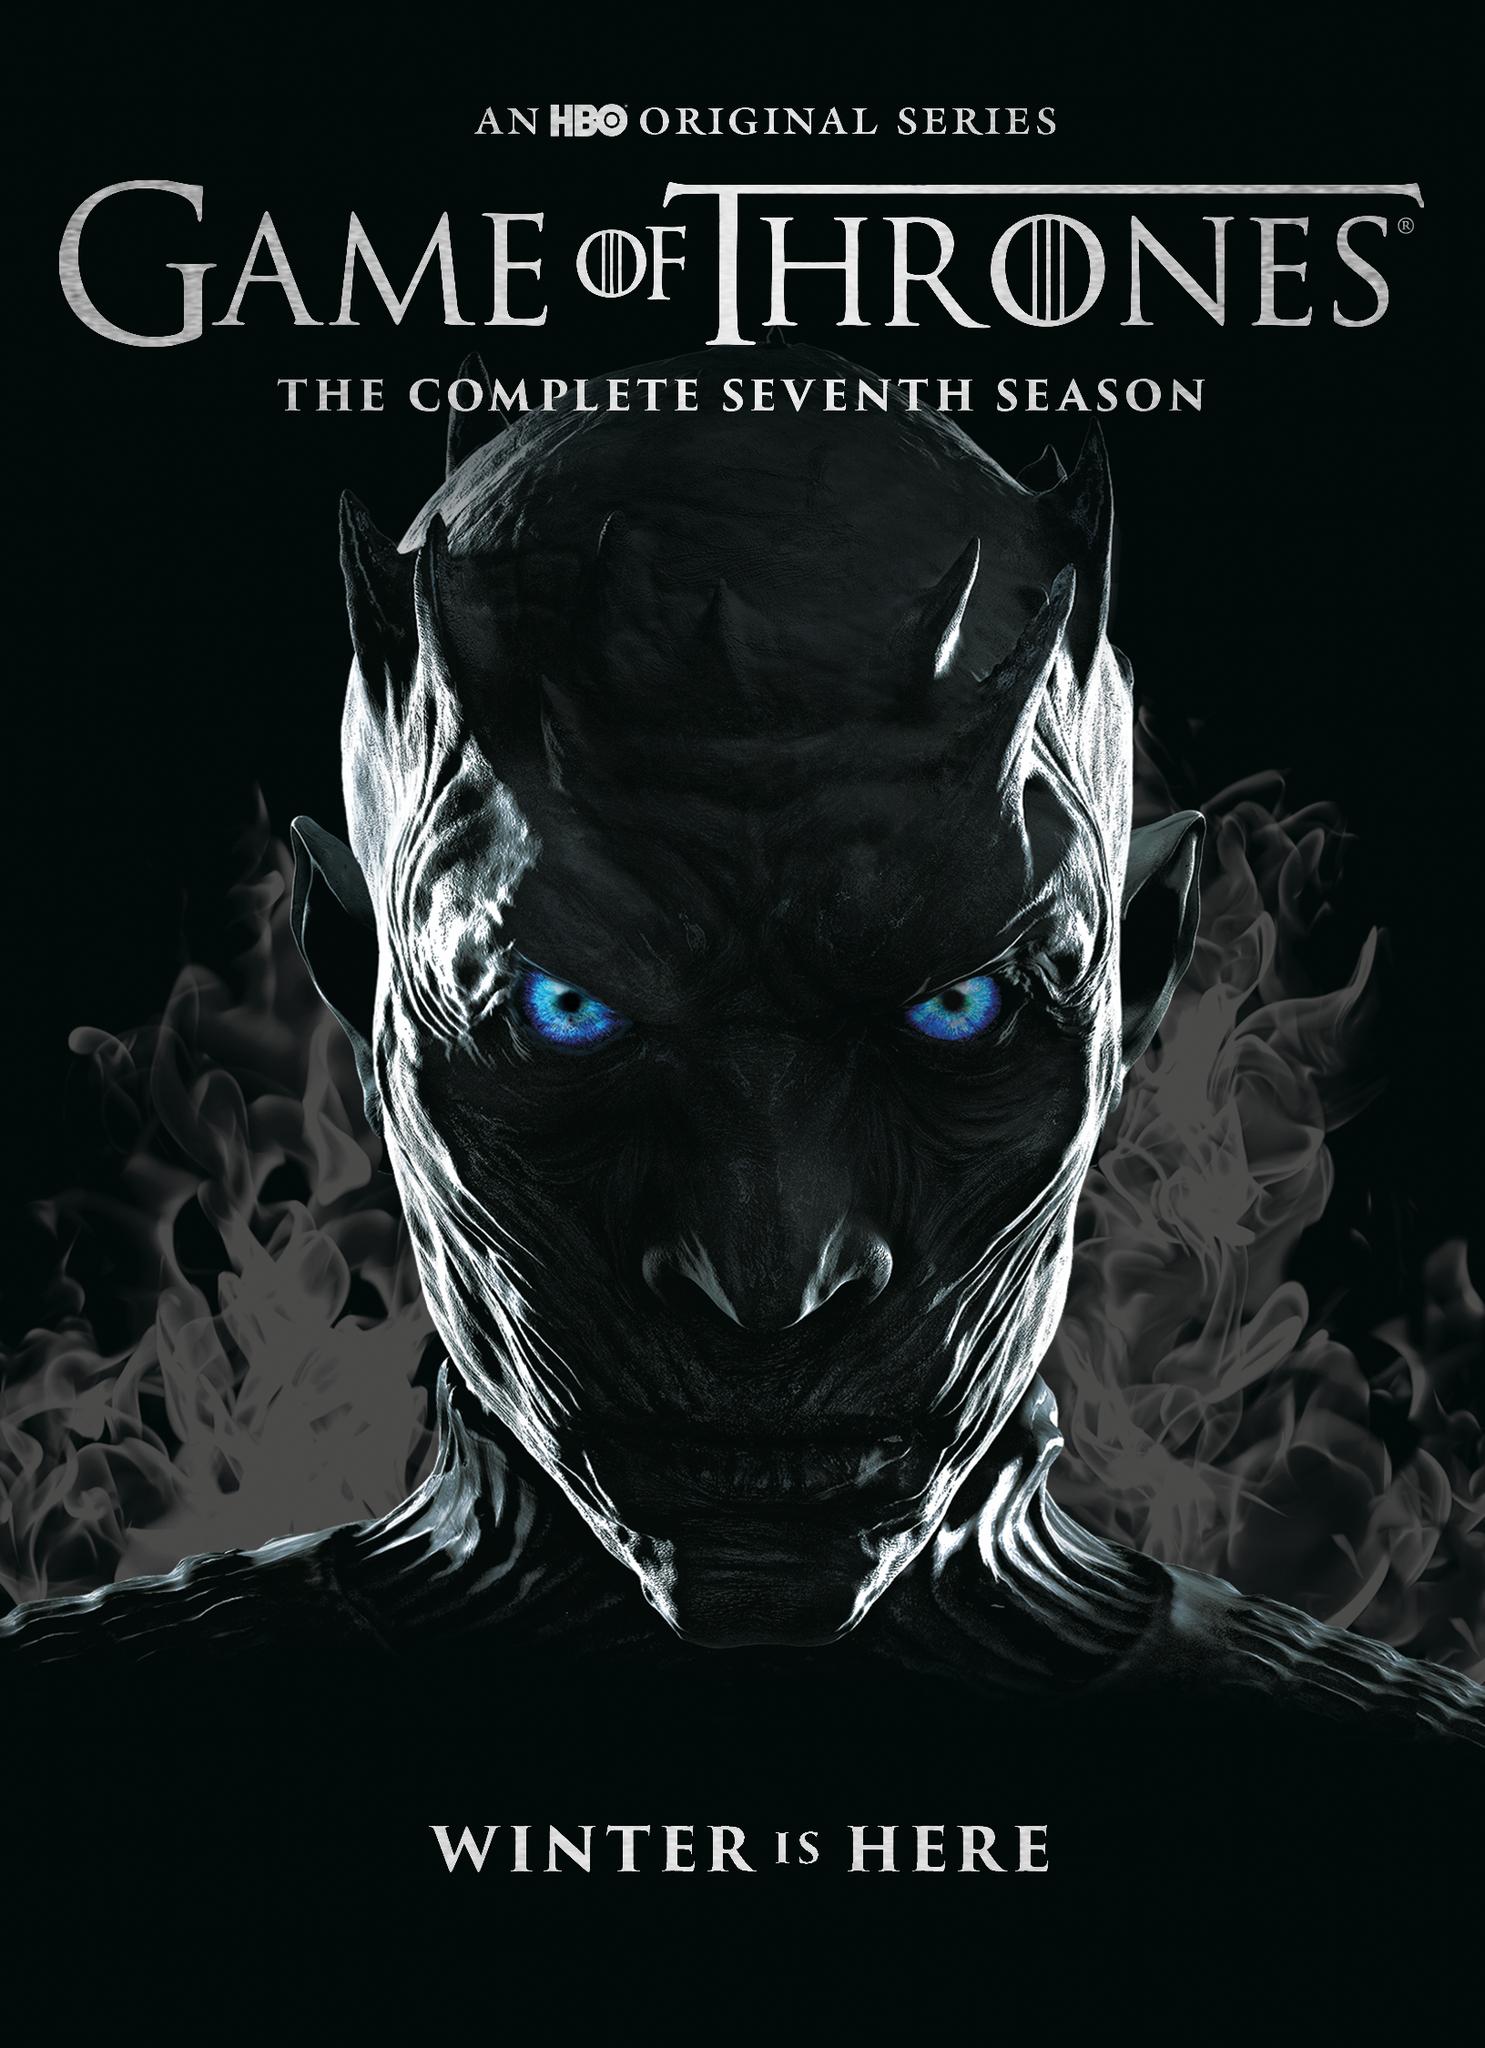 Game Of Thrones S07 FULL 2017 | WEB-DL 1080p مترجم -- Seeders: 1 -- Leechers: 0